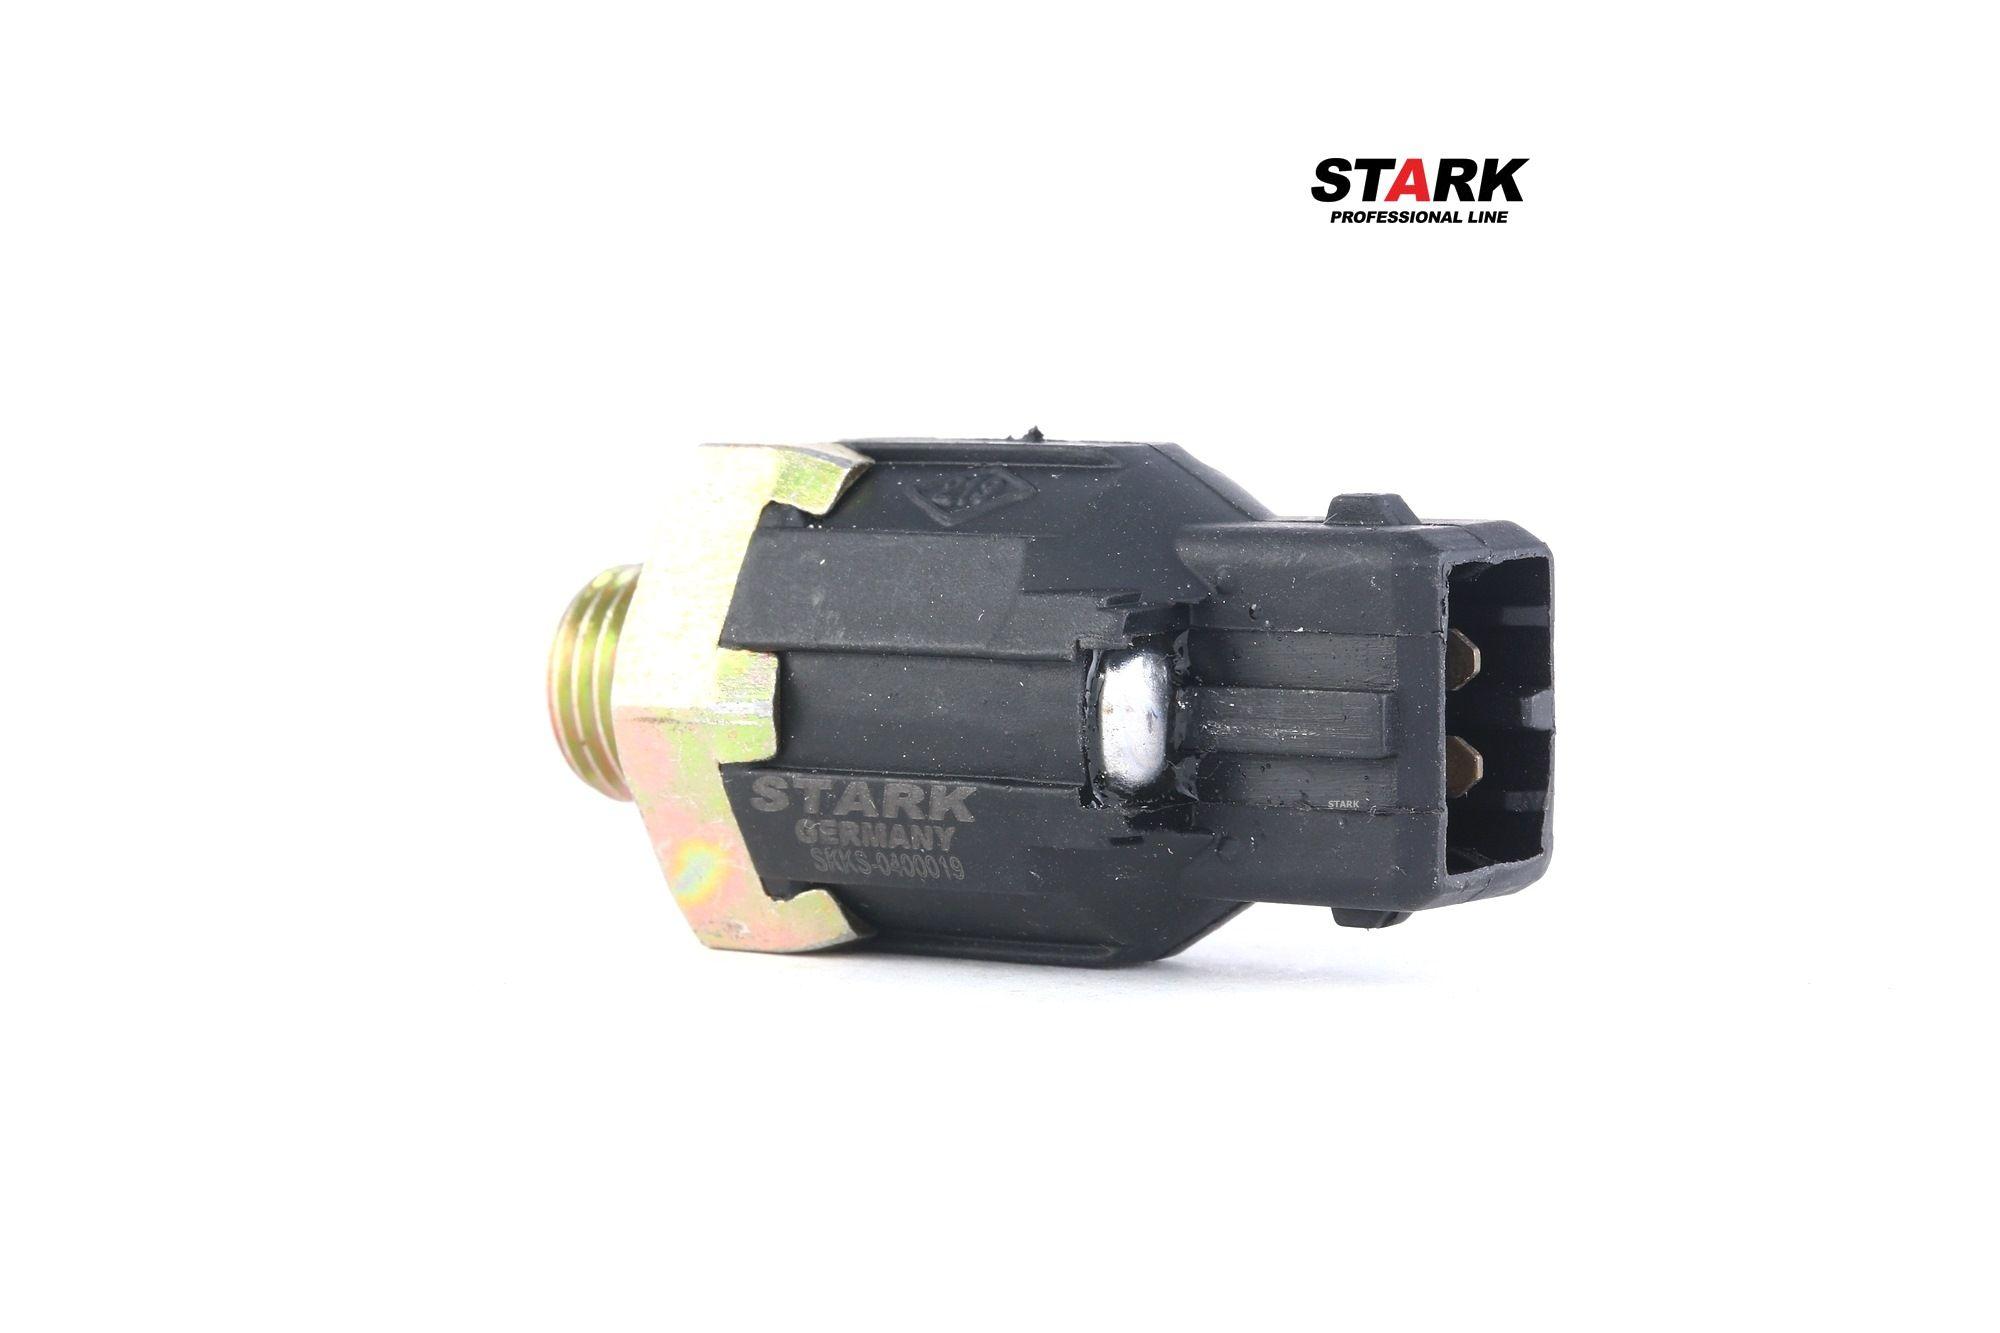 STARK Klopfsensor SKKS-0400019